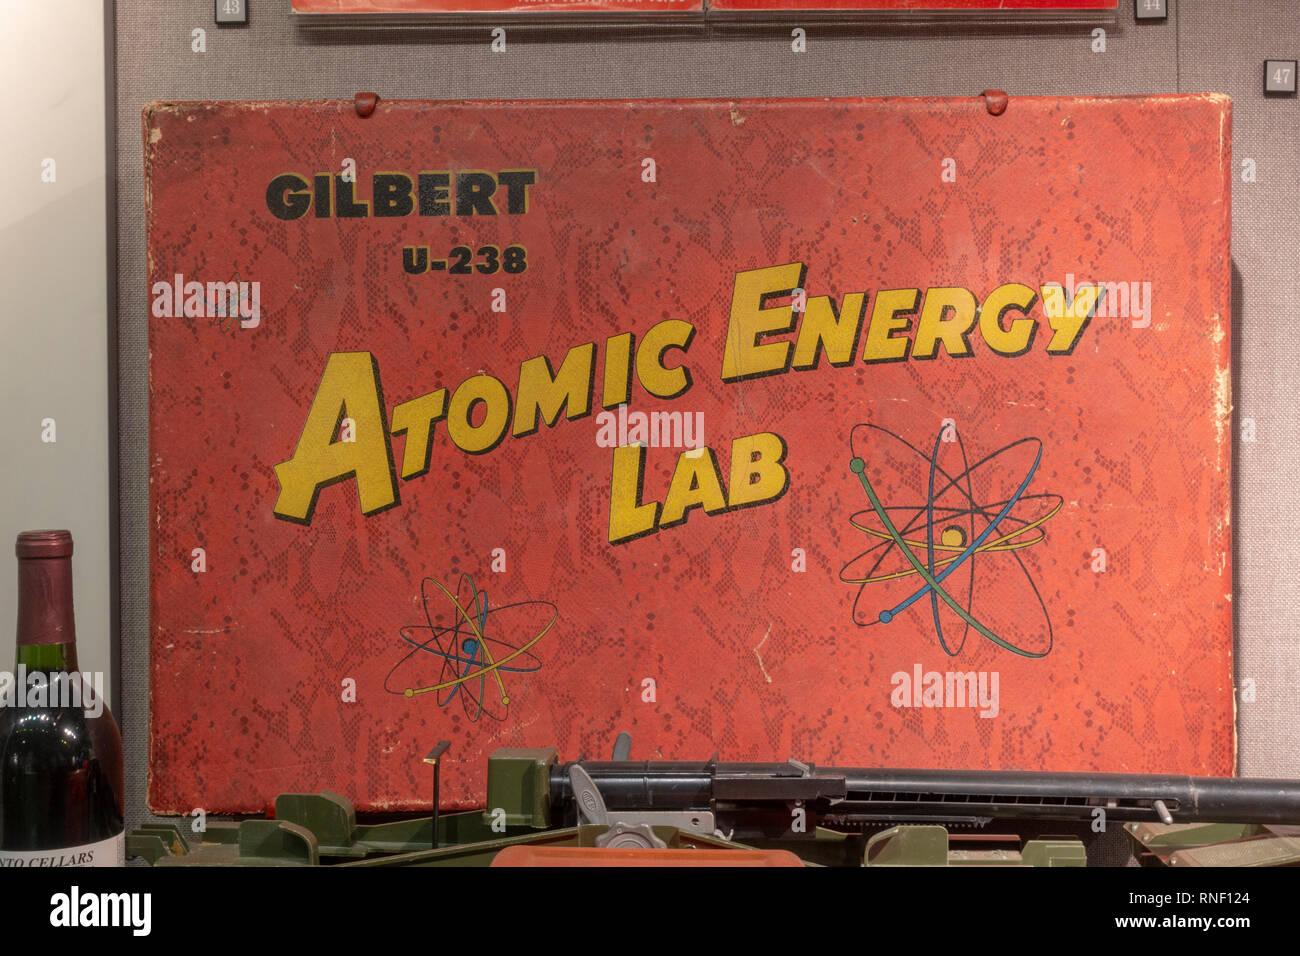 A Gilbert U-238 Atomic Energy Lab toy set, Nevada, United States. - Stock Image